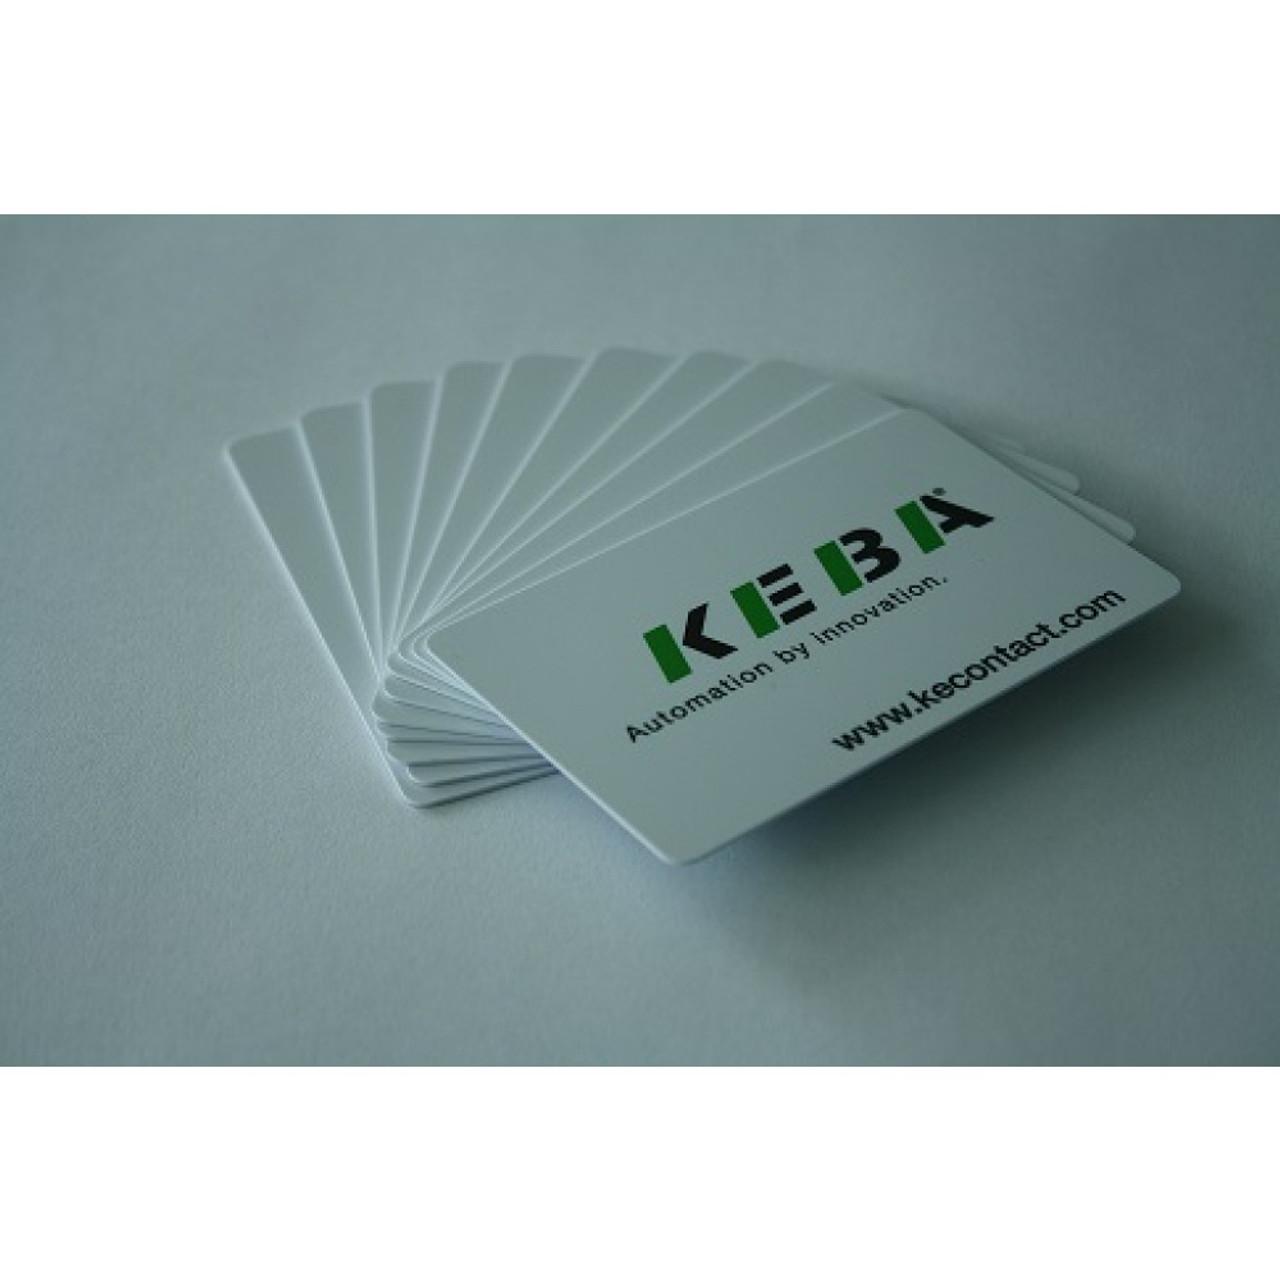 RFID cards - Keba design - 10 pcs (not discountable) / 96,089